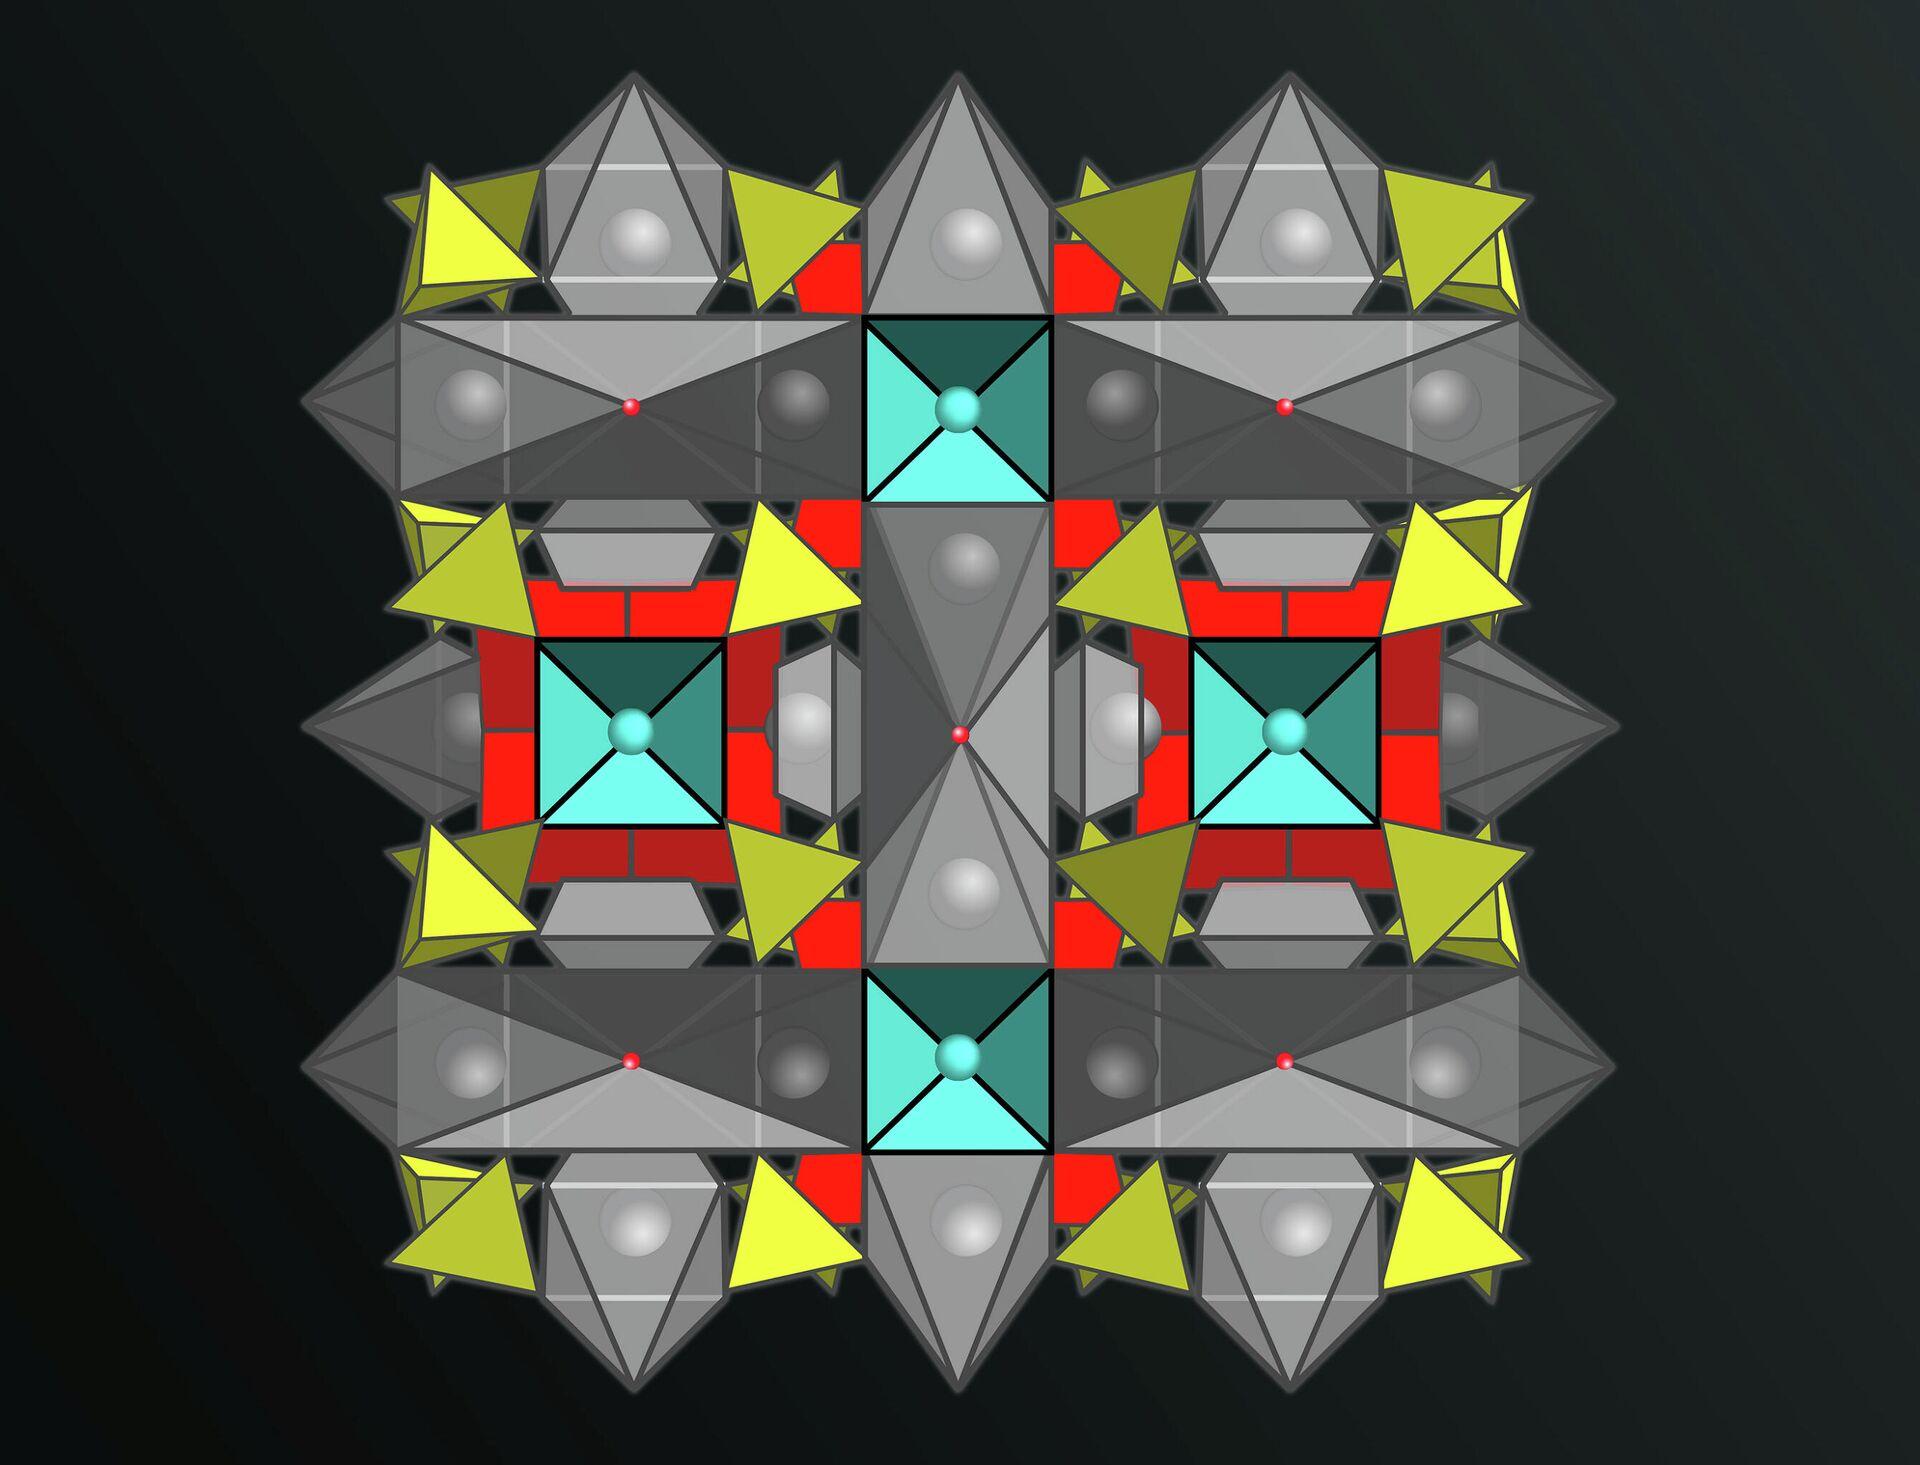 Una estructura ideal bidimensional Kagomé - Sputnik Mundo, 1920, 06.09.2021